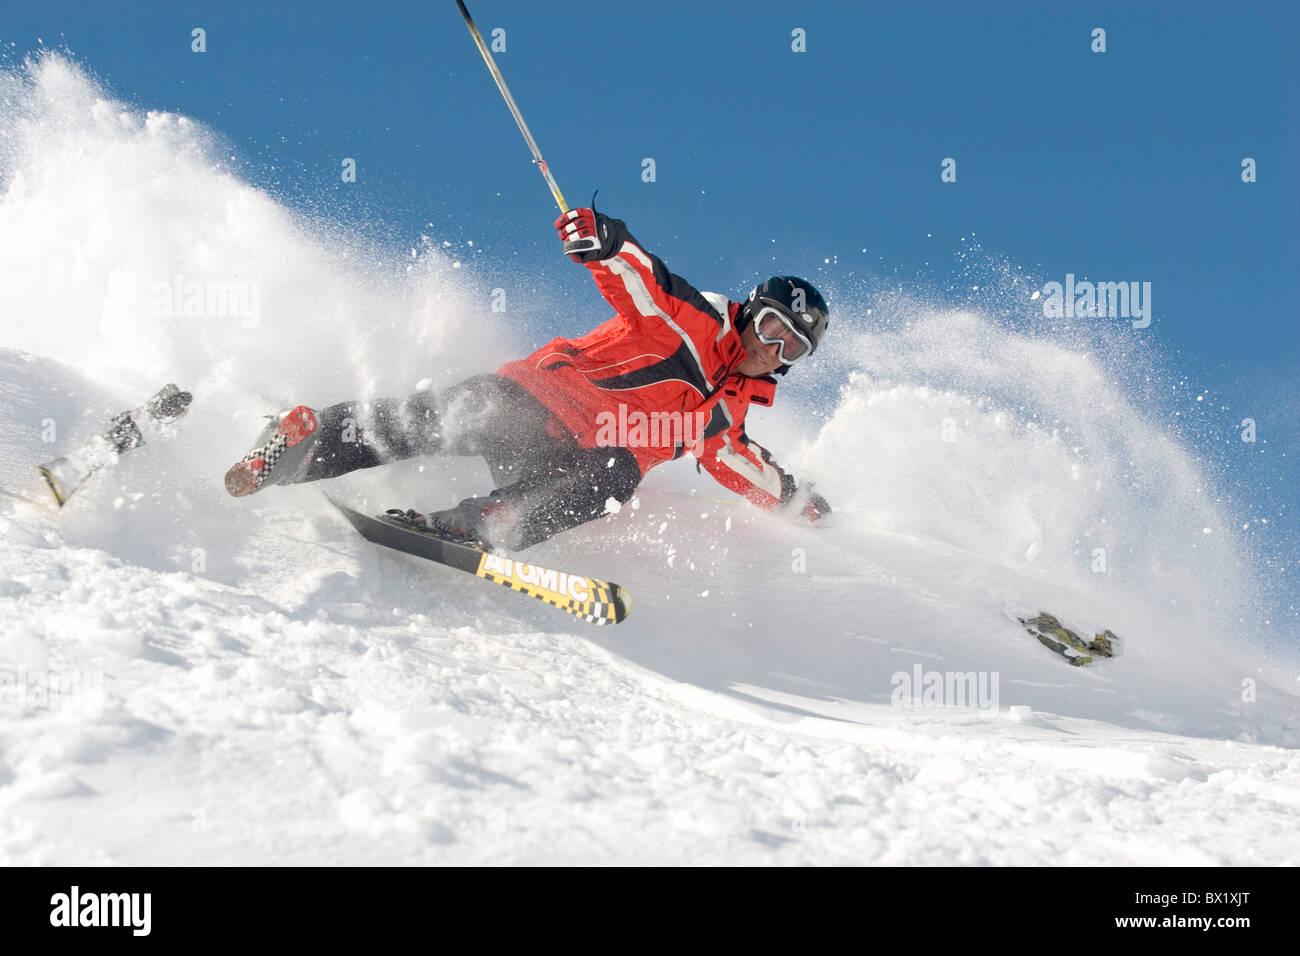 Skiing accident stock photos